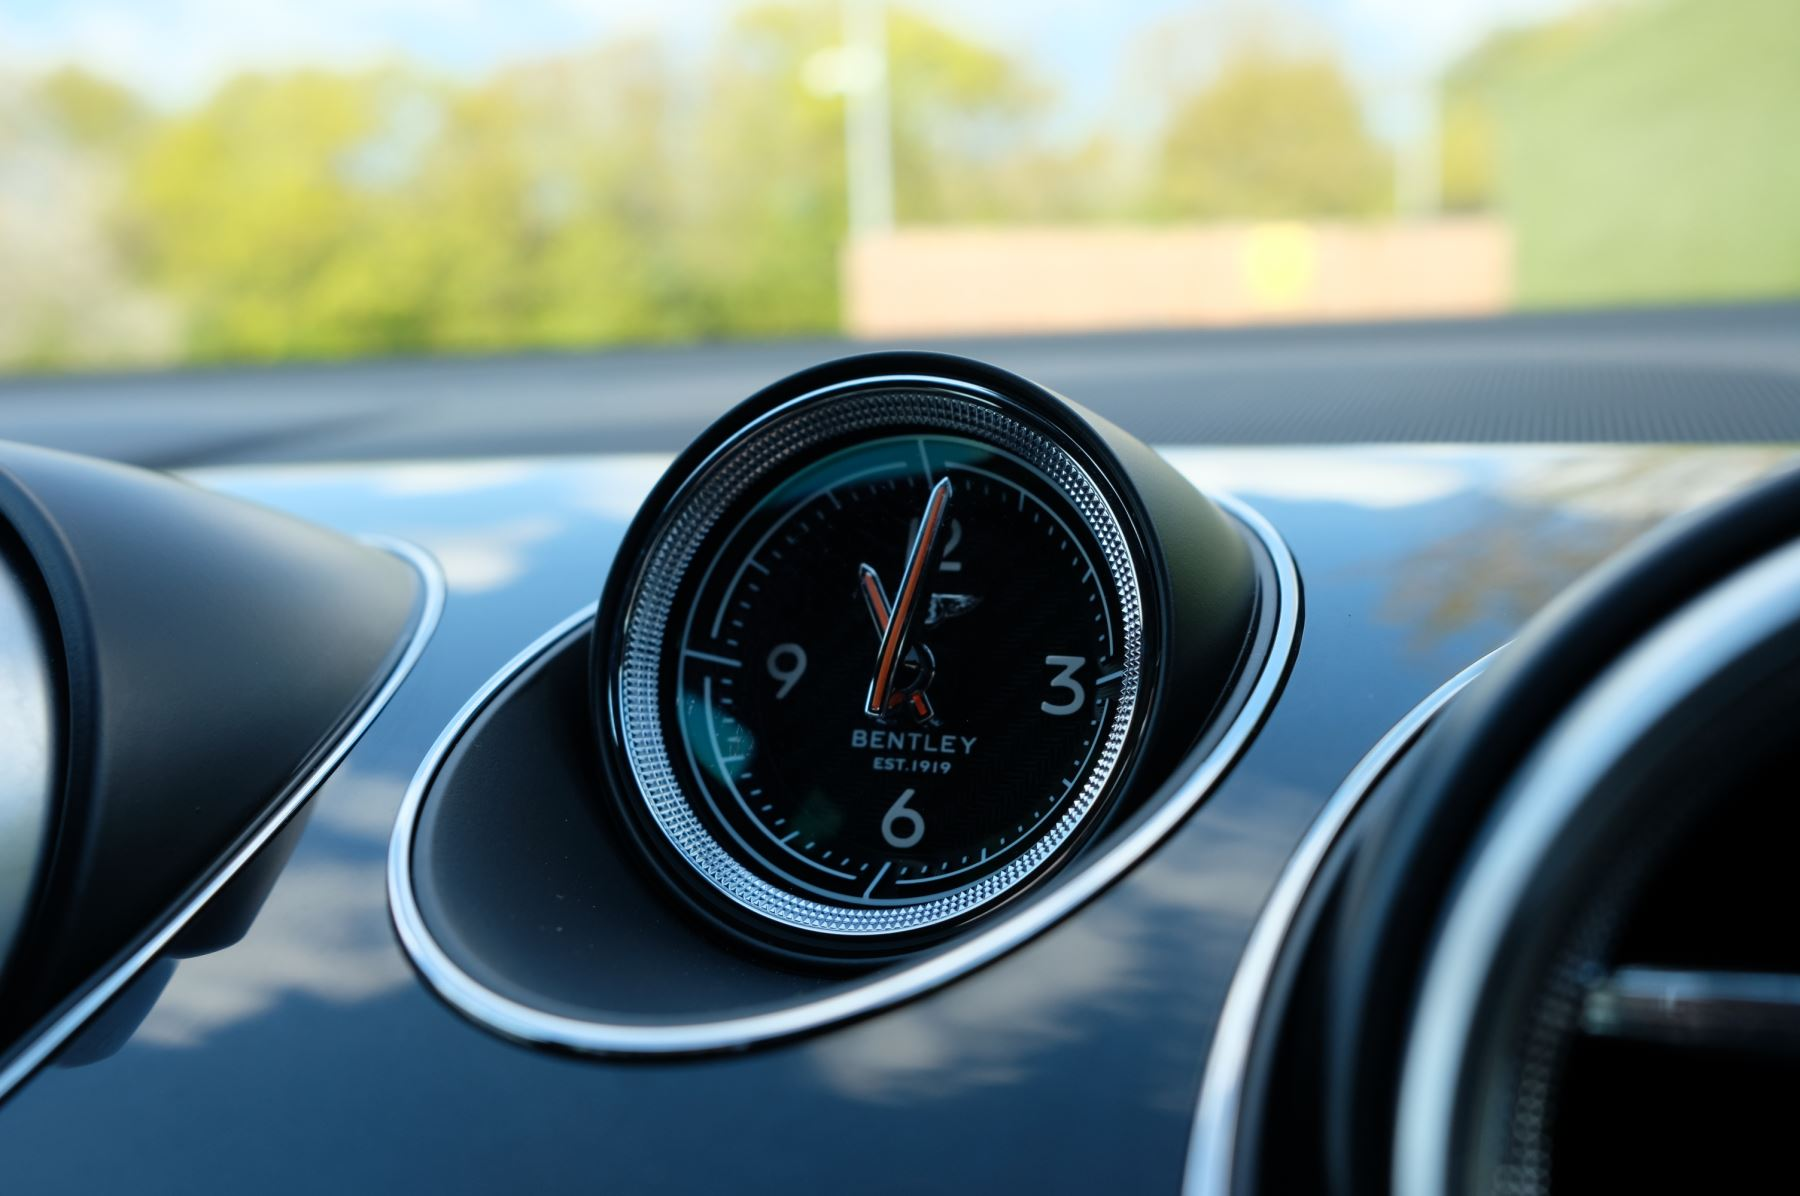 Bentley Bentayga 4.0 V8 5dr image 24